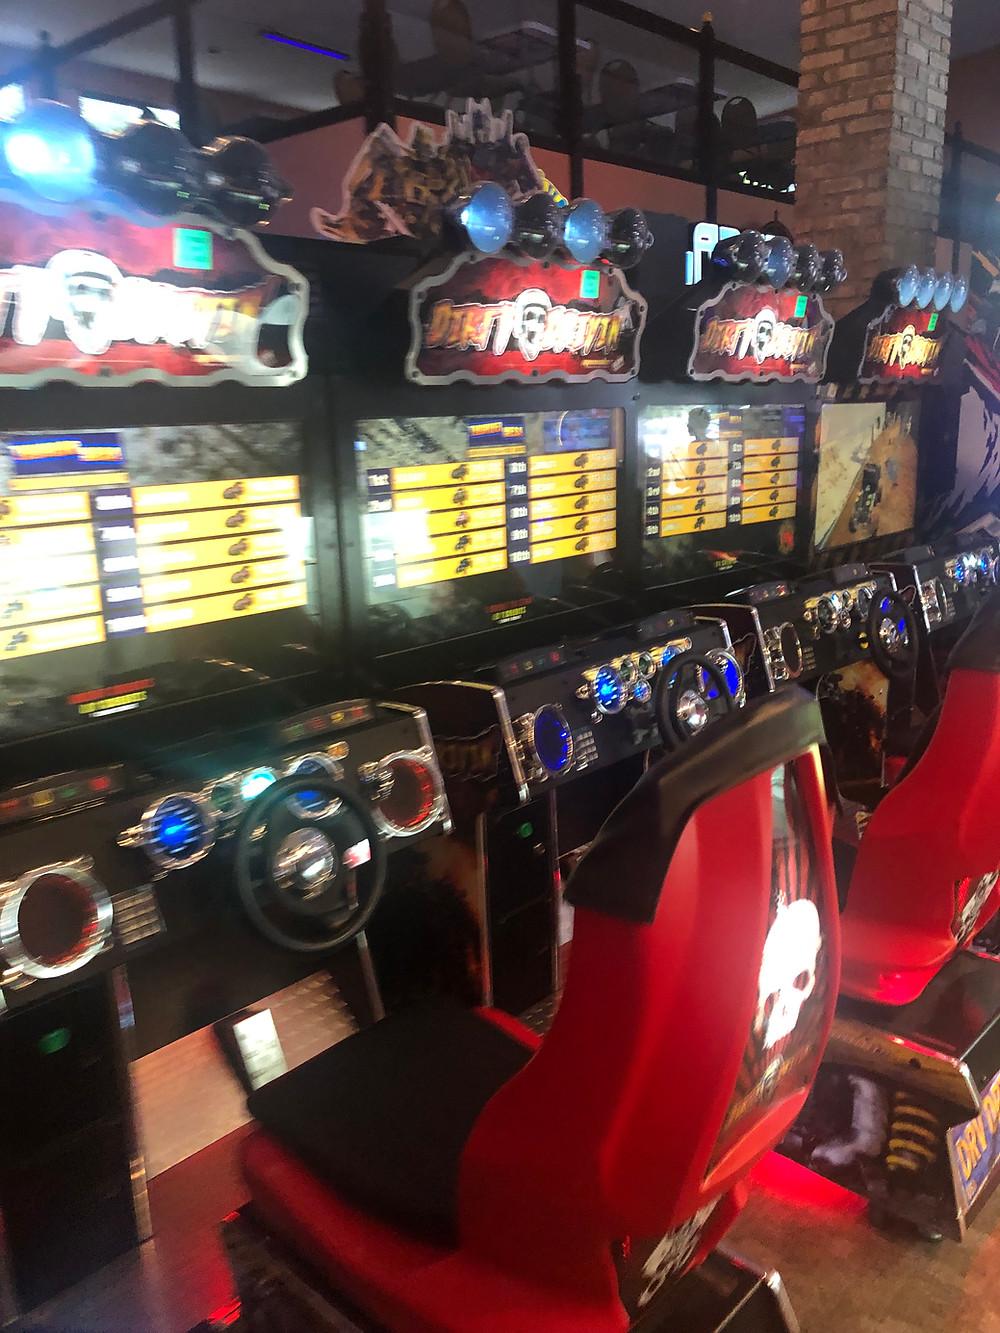 A row of racing games at an arcade